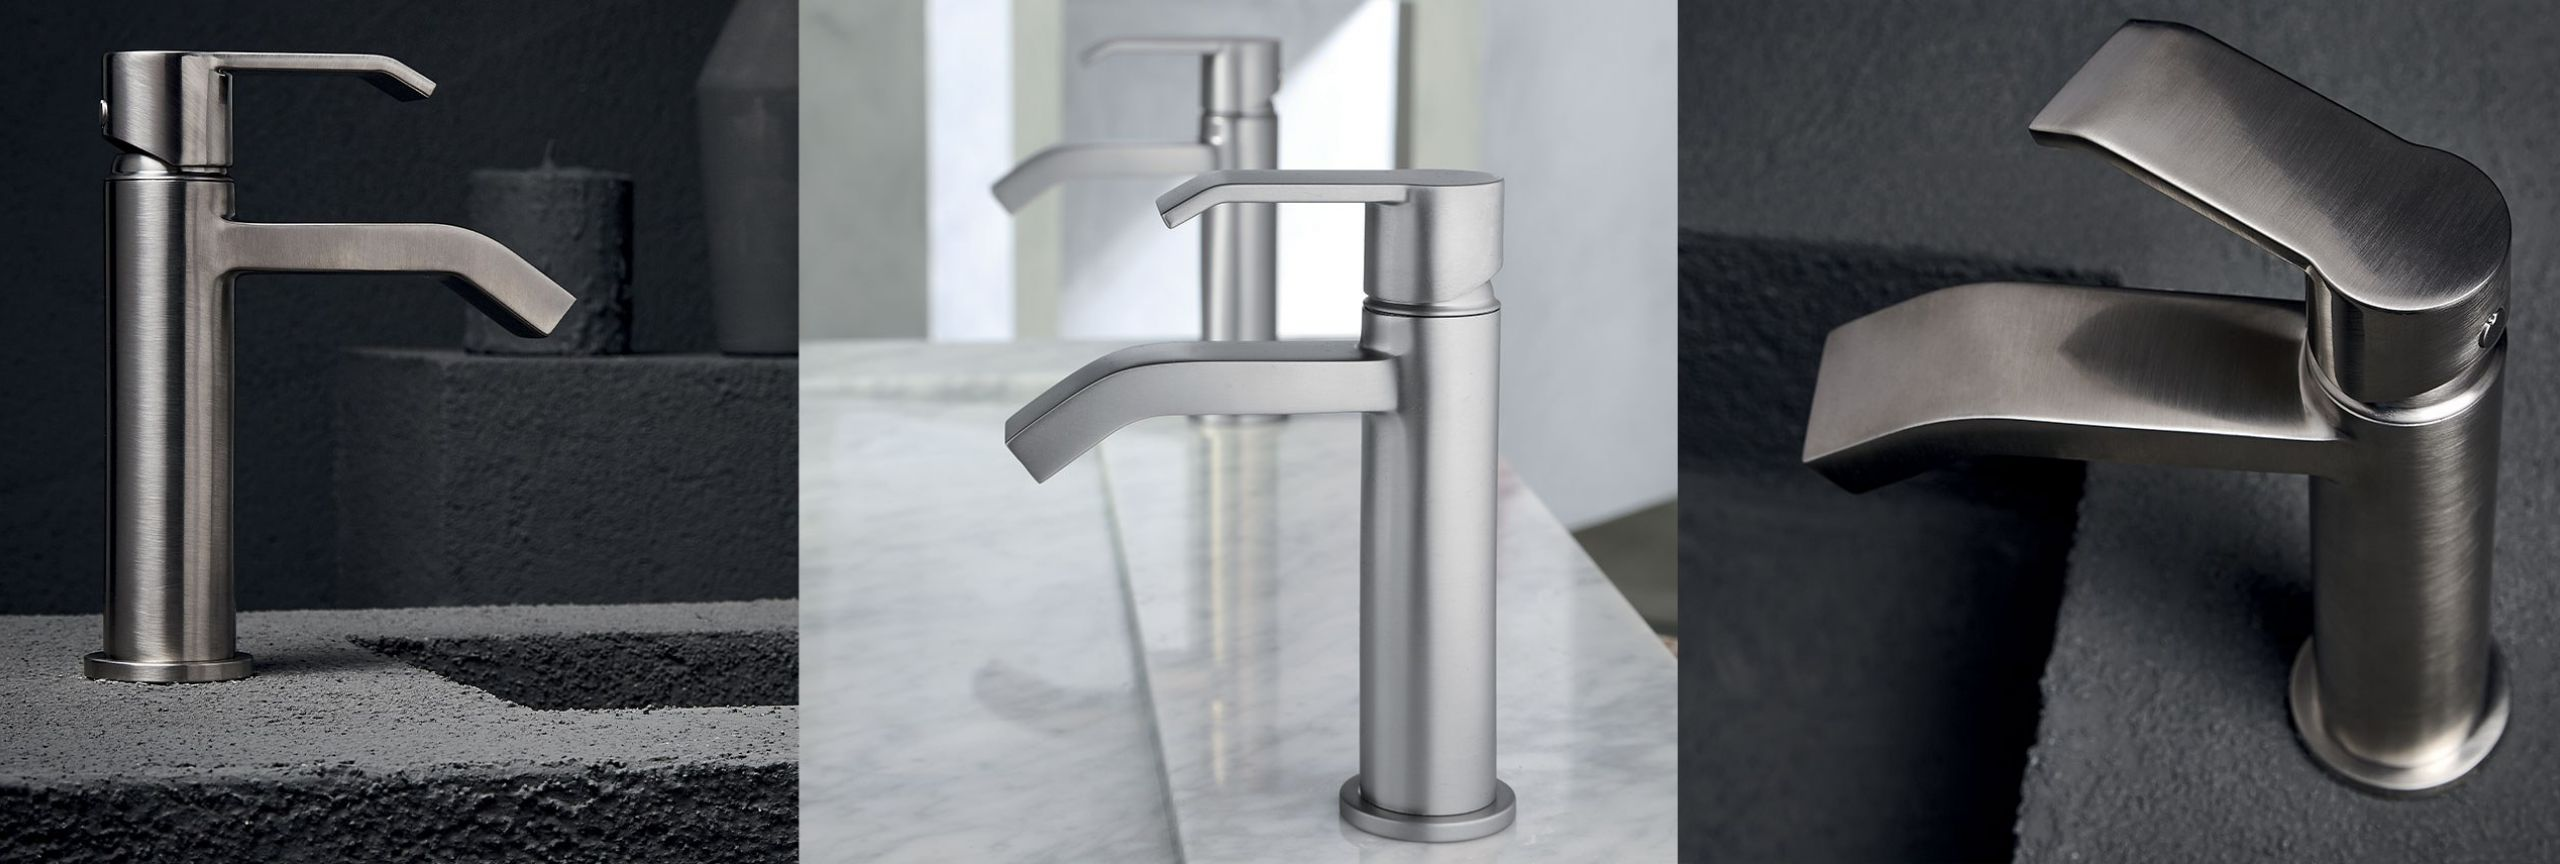 Single lever faucet e5